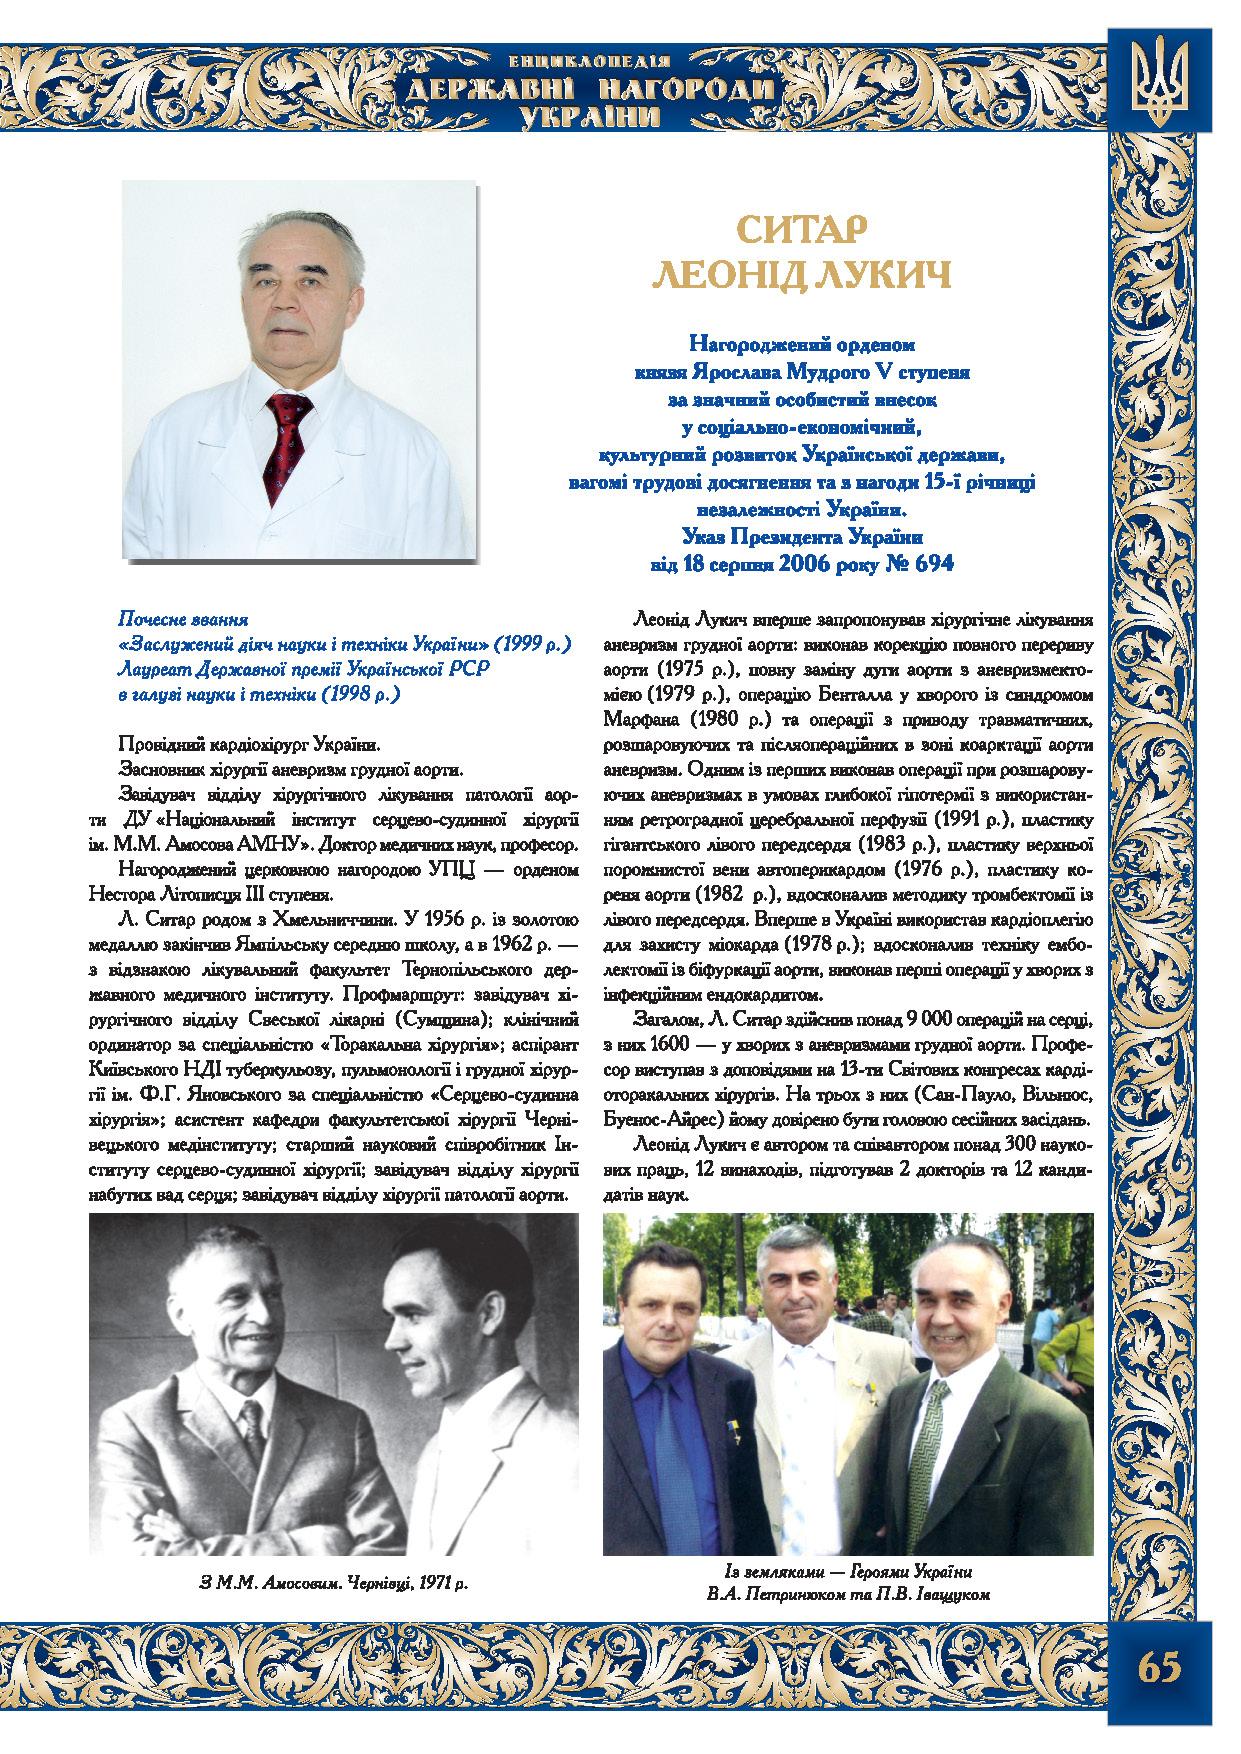 Ситар Леонід Лукич